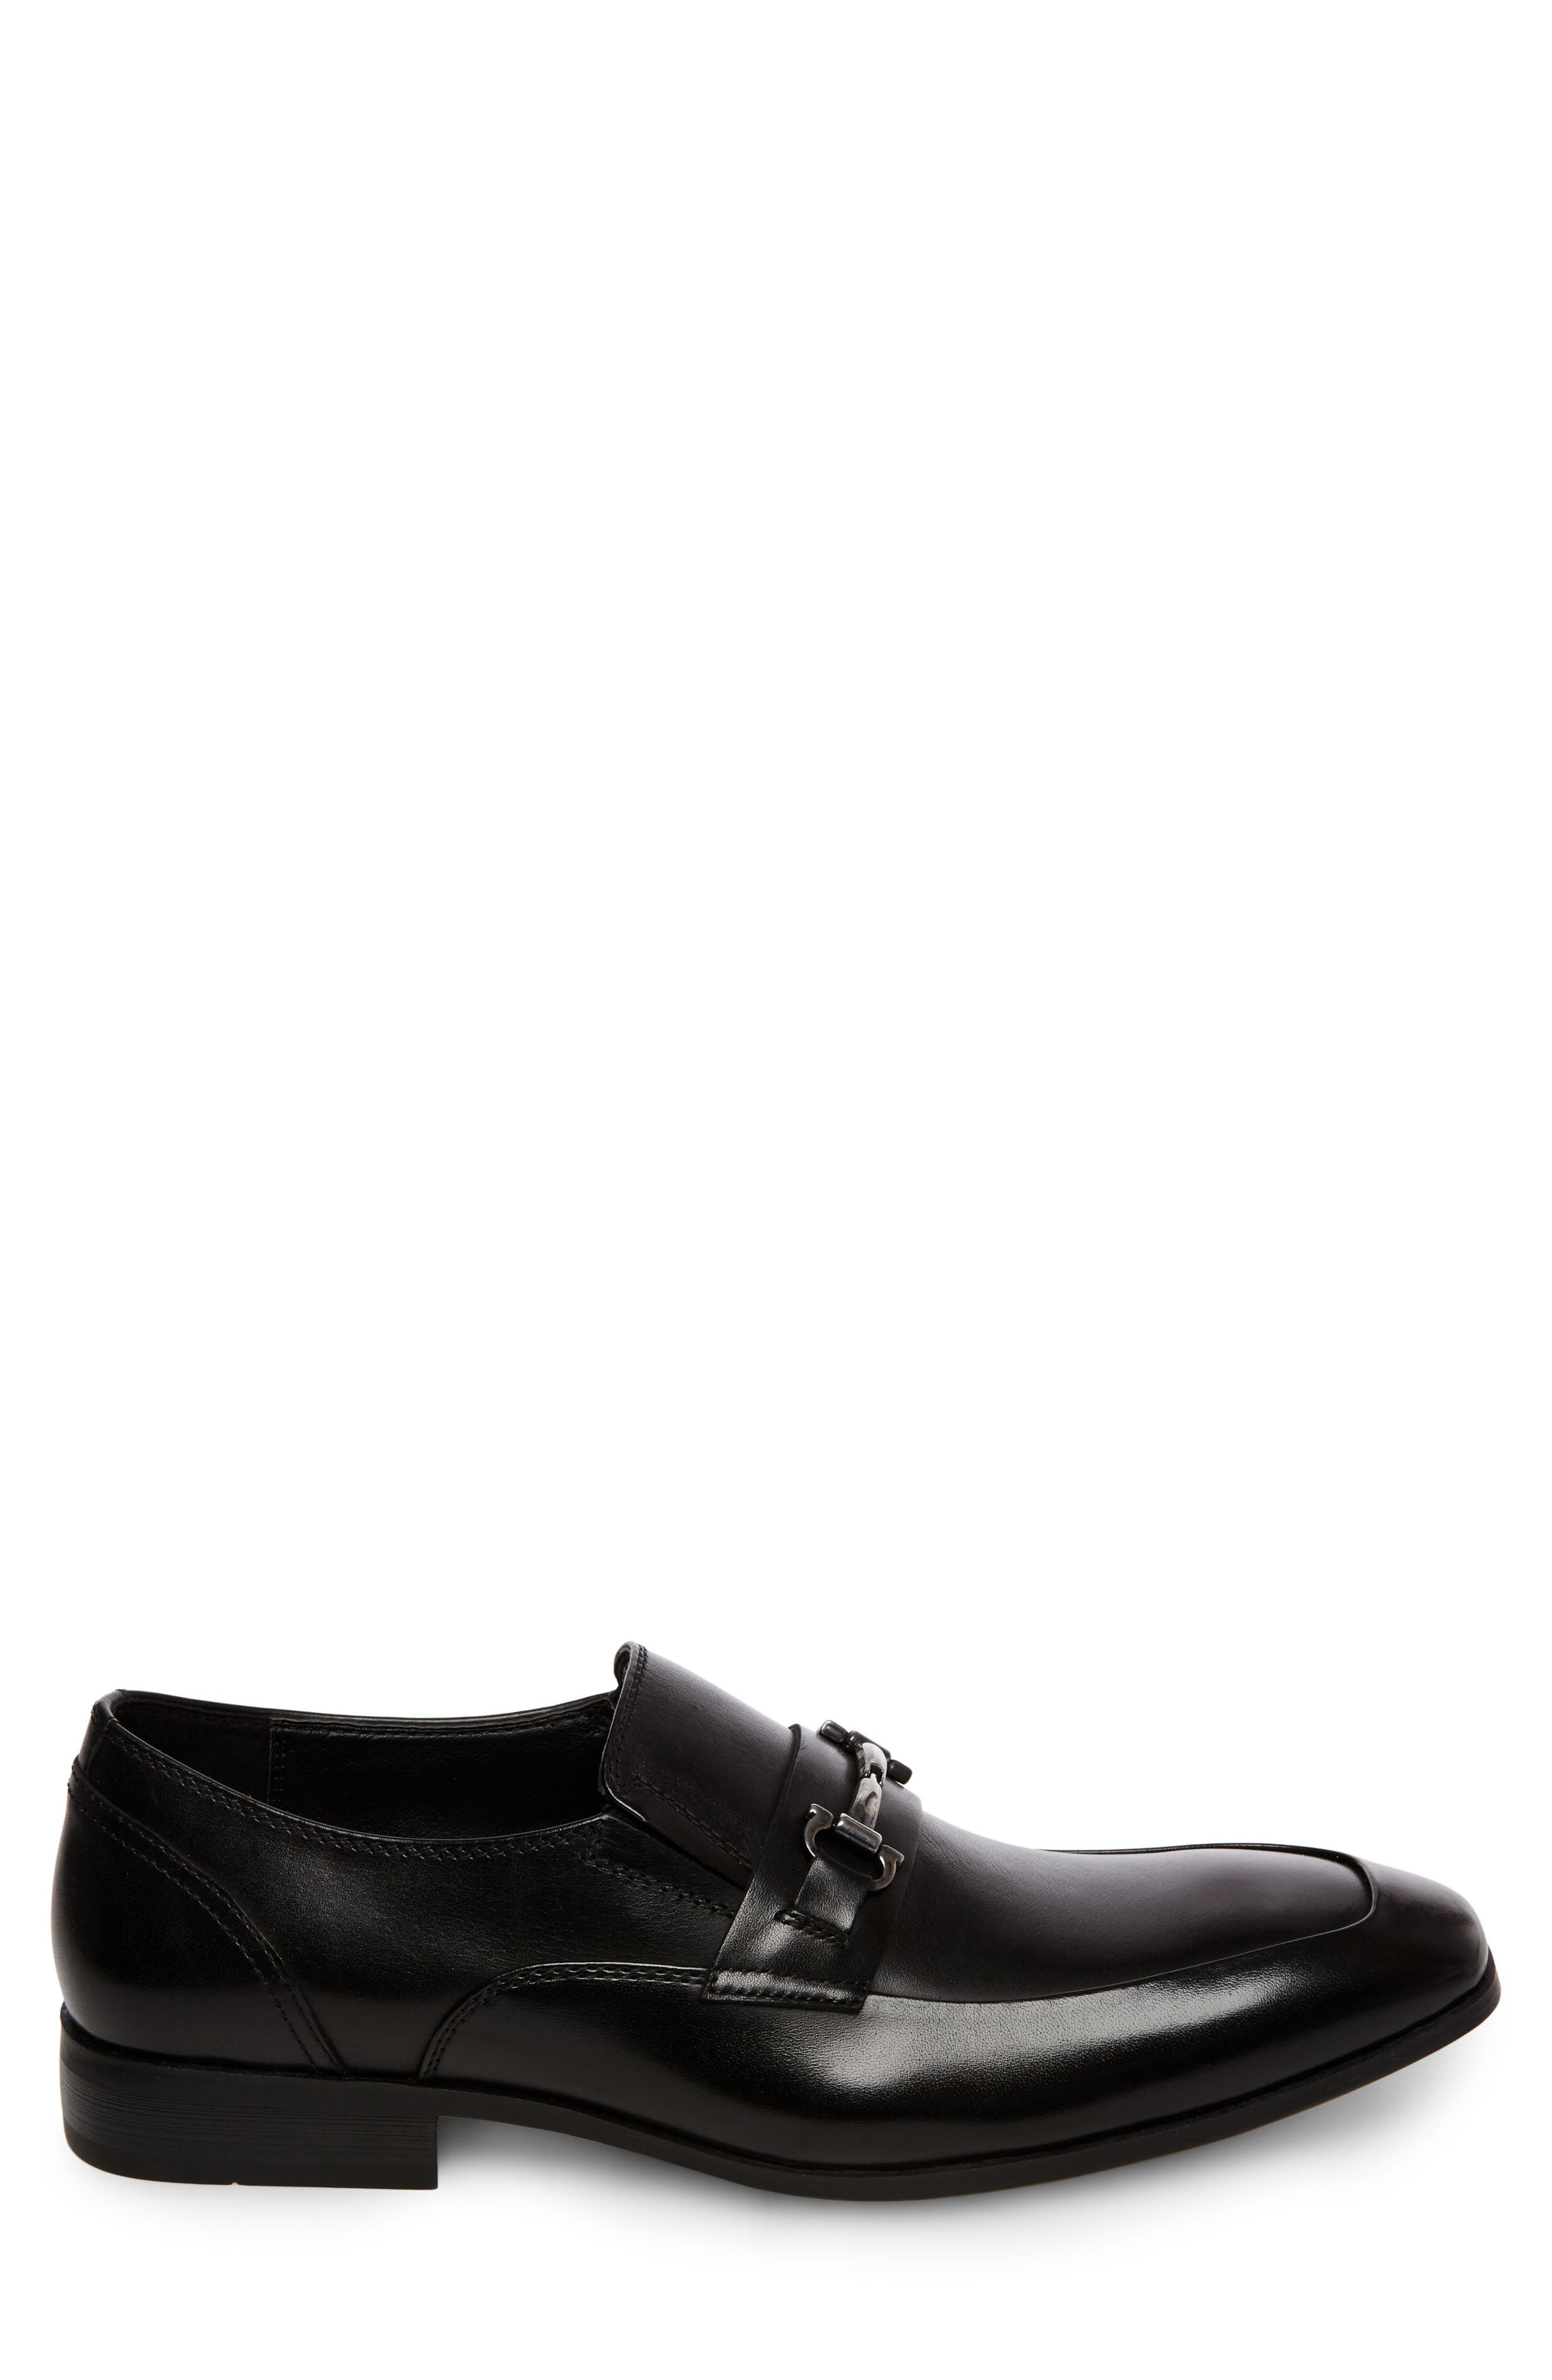 Mendal Bit Loafer,                             Alternate thumbnail 3, color,                             Black